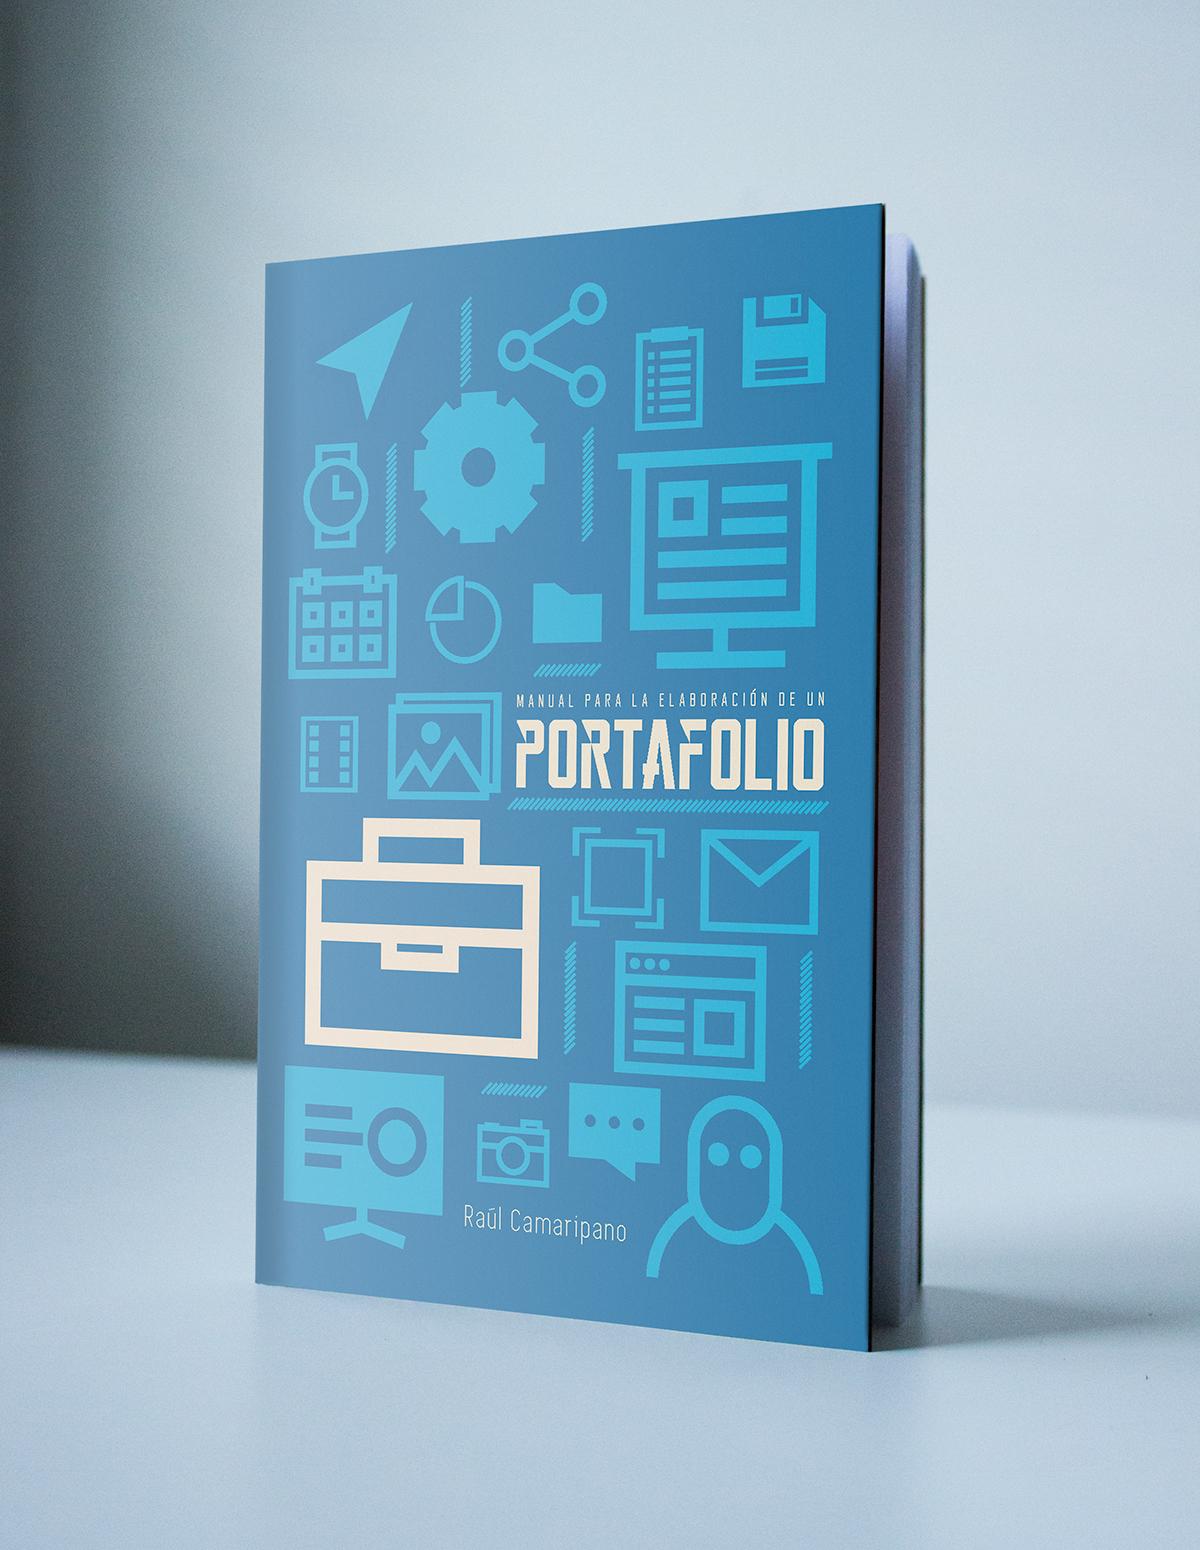 portafolio manual portfolio digital tesis thesis Project proyecto